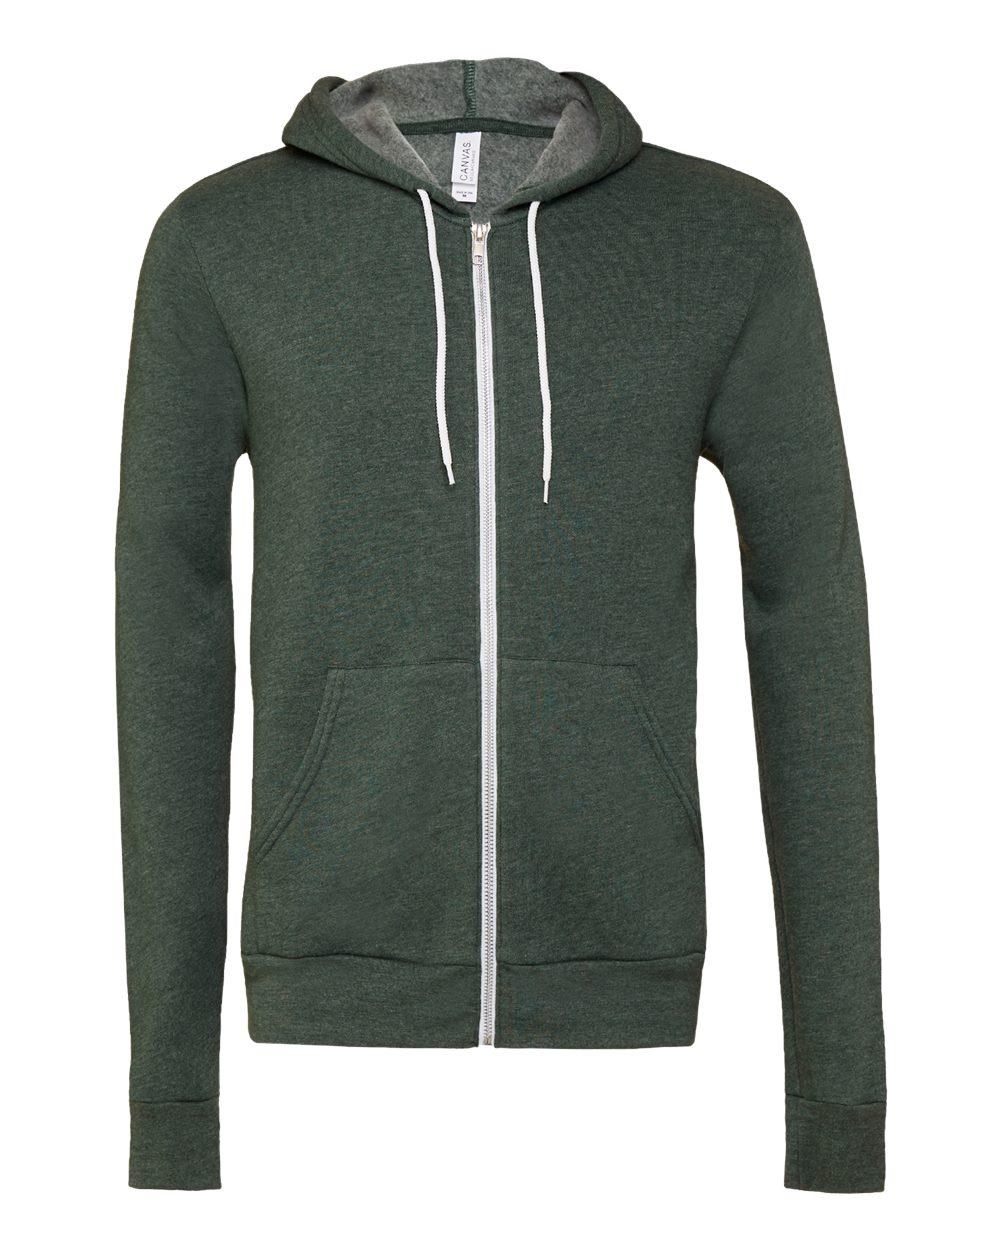 Bella-Canvas-Unisex-Full-Zip-Up-Hooded-Sweatshirt-Blank-Hoodie-3739-up-to-3XL thumbnail 38